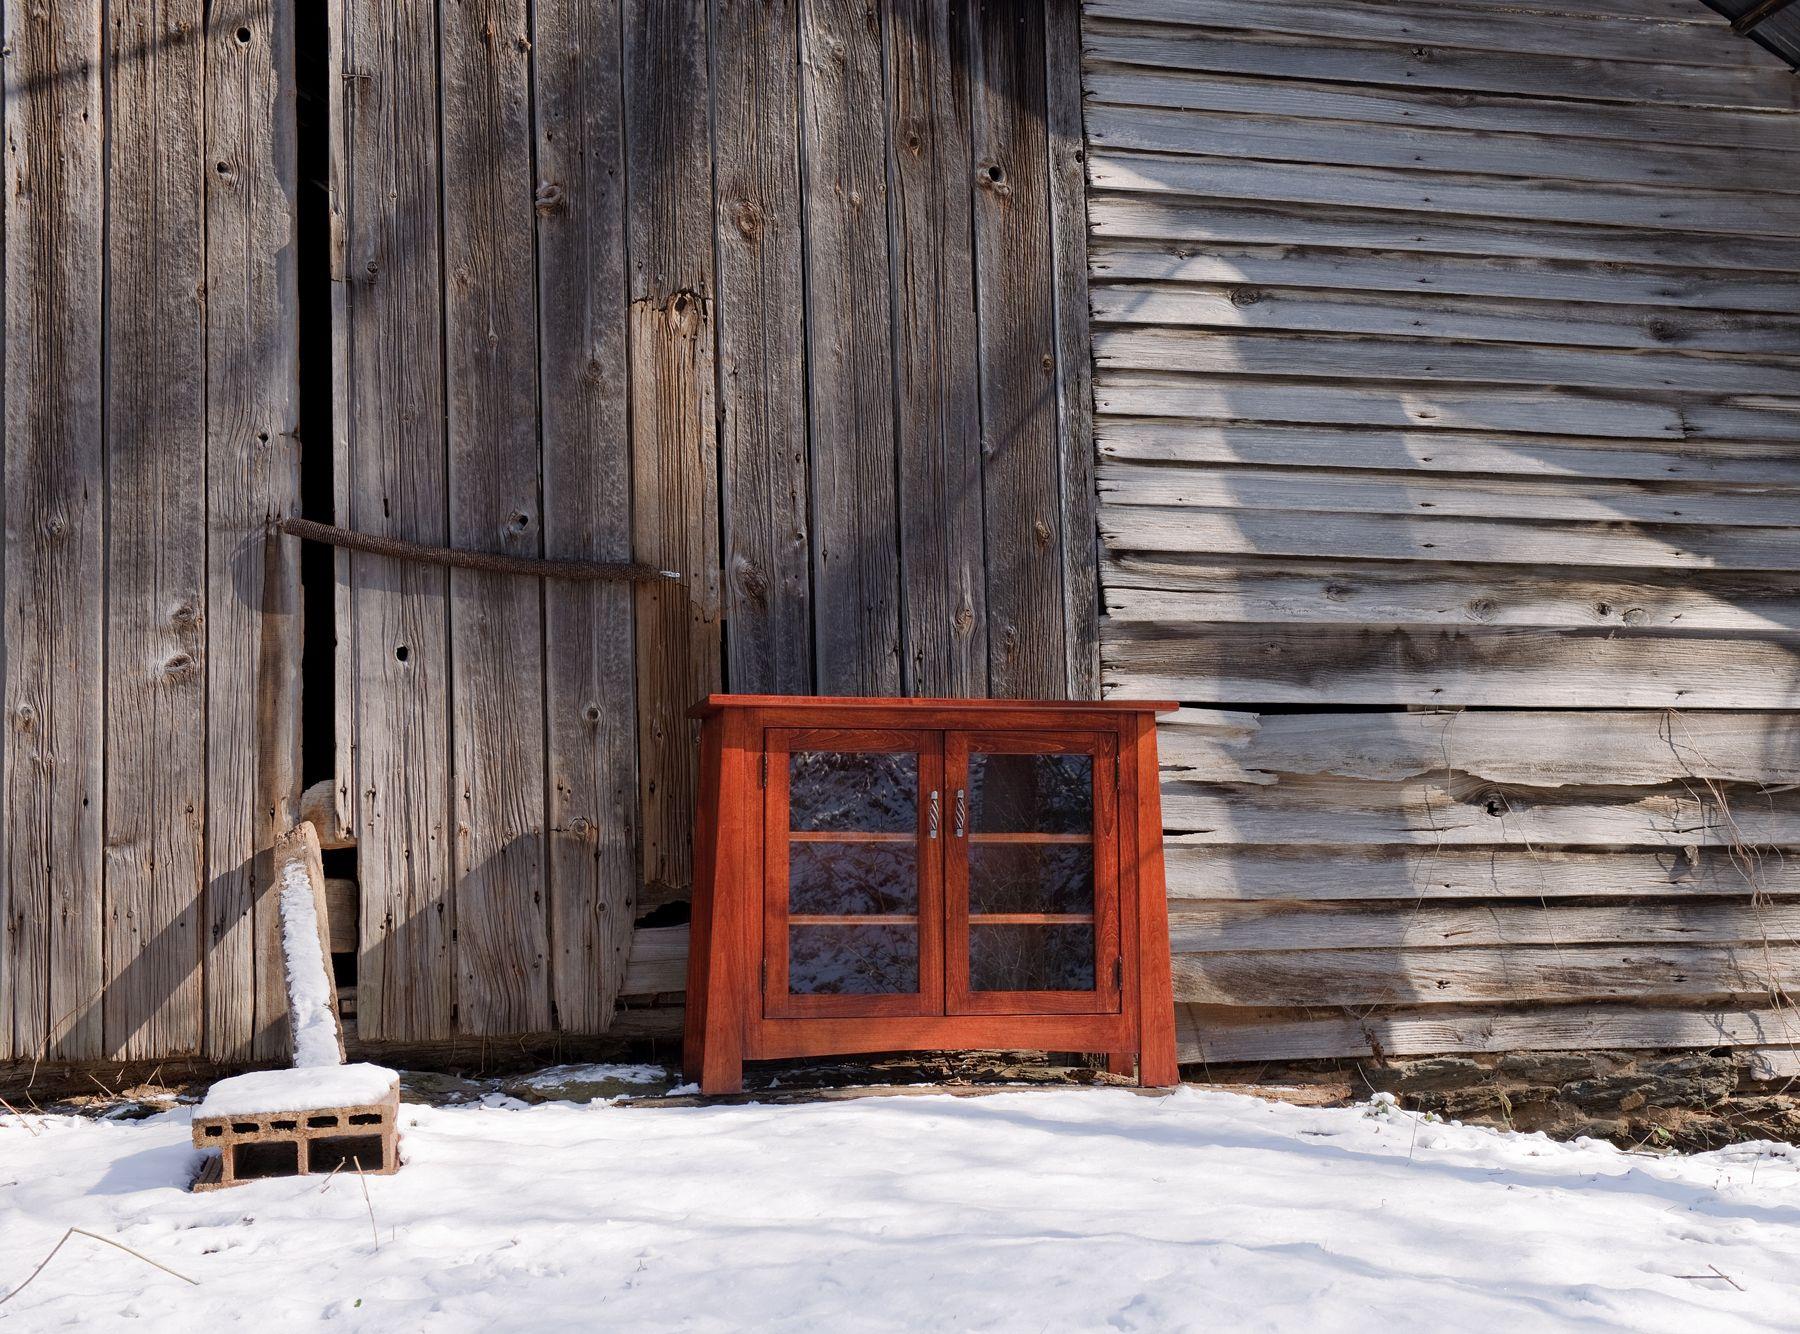 Amish furniture of bristol - Www Amishfurnitureofbristol Com Amish Furnitureroom Kitchenbristolfamily Room